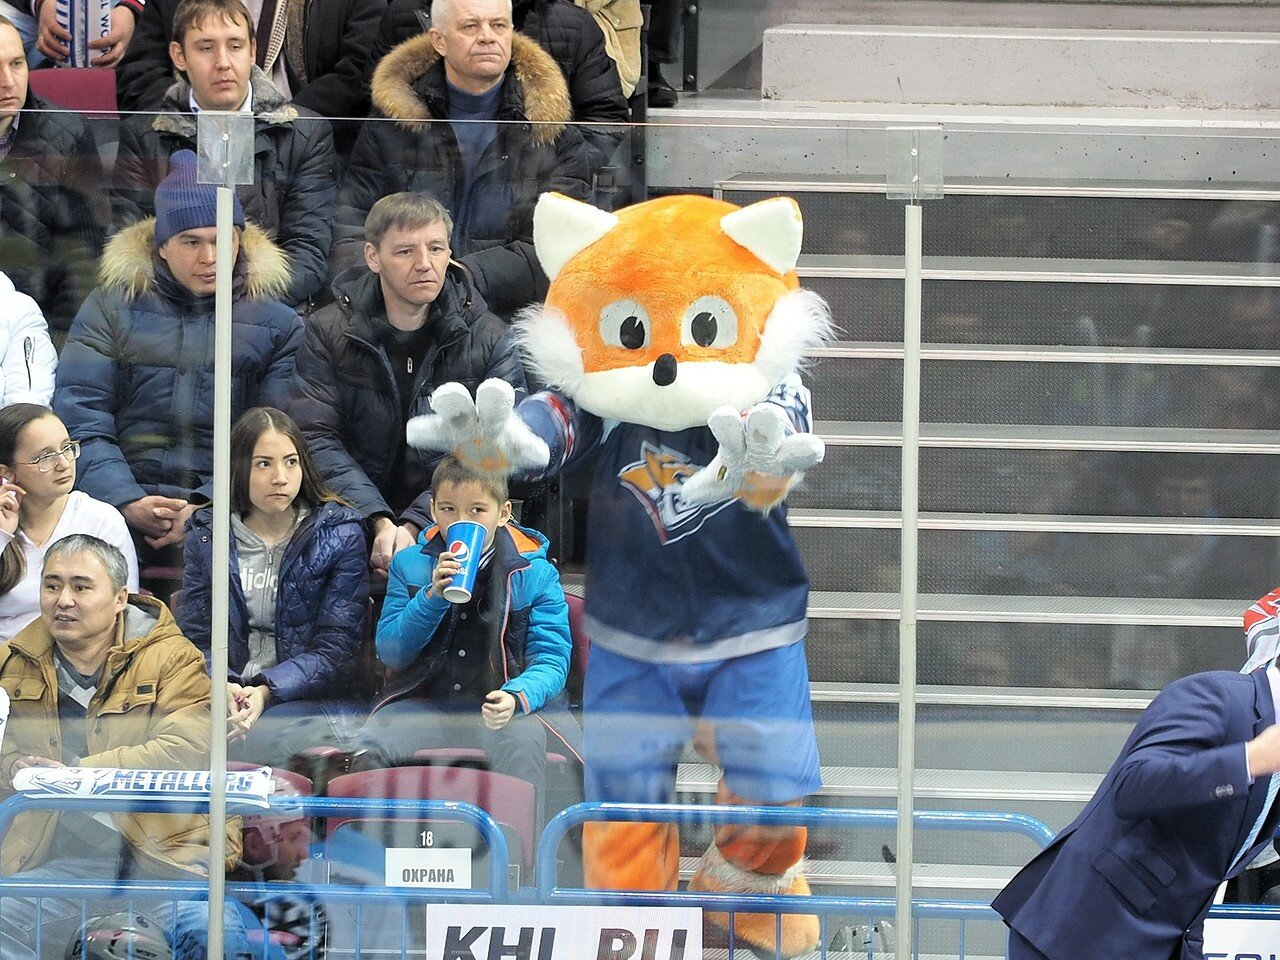 110Плей-офф 2016 Восток 1/2 Металлург - Сибирь 10.03.2016